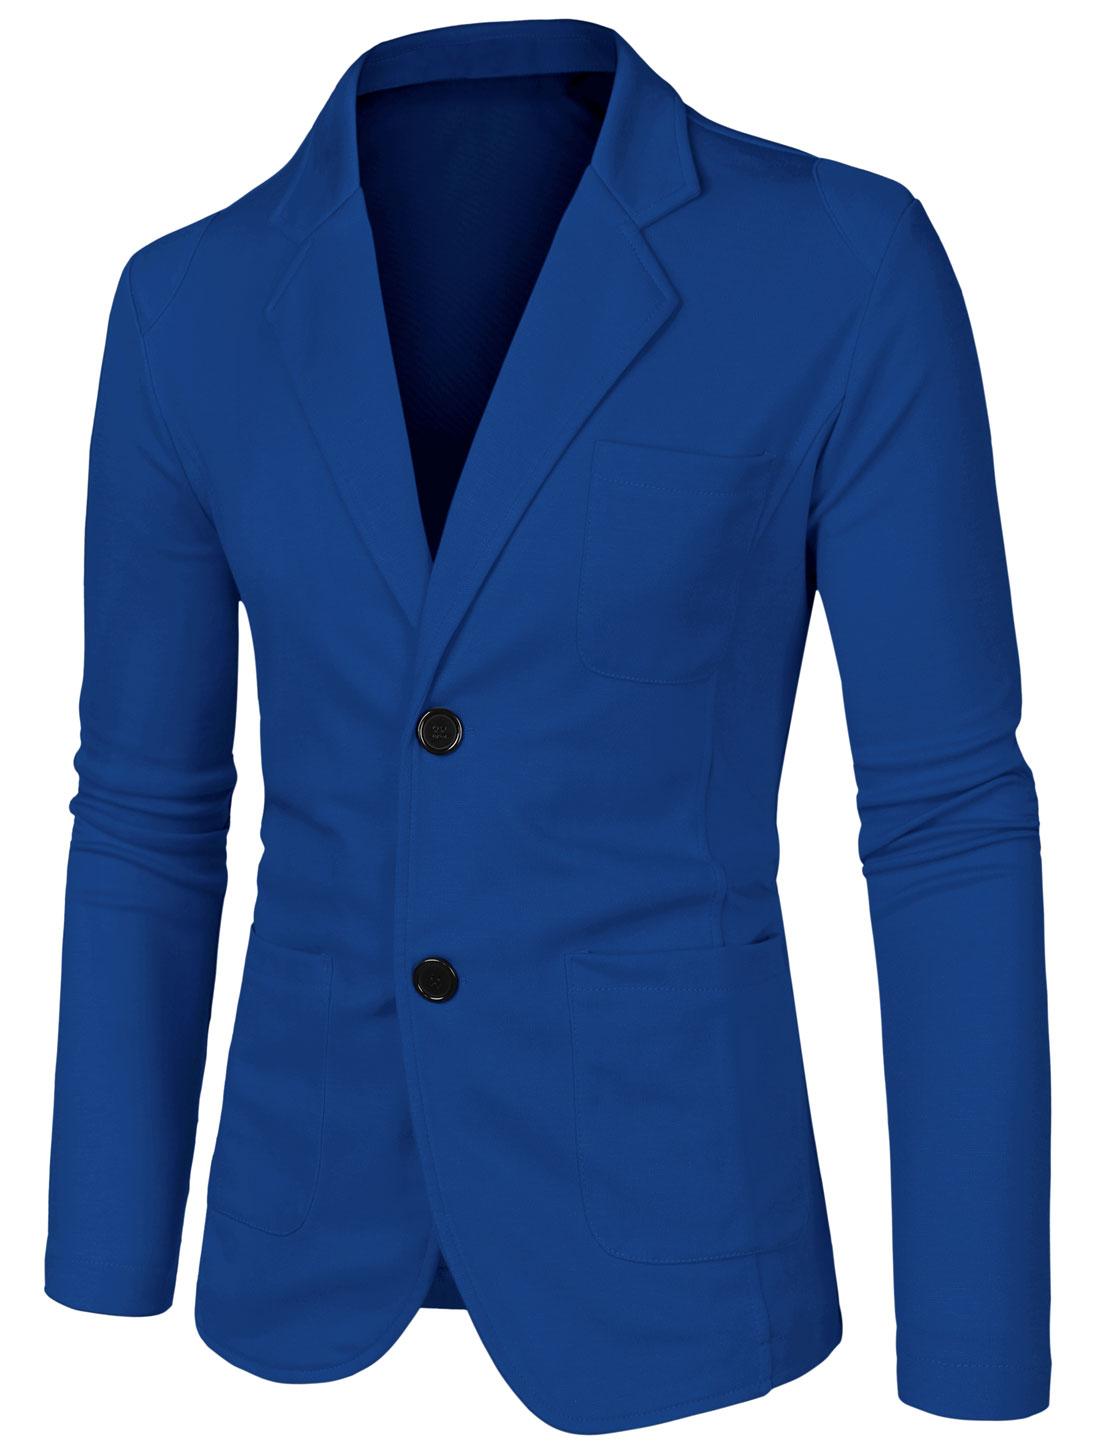 Men Notched Lapel Solid Color Long Sleeve Knit Blazer Blue 38